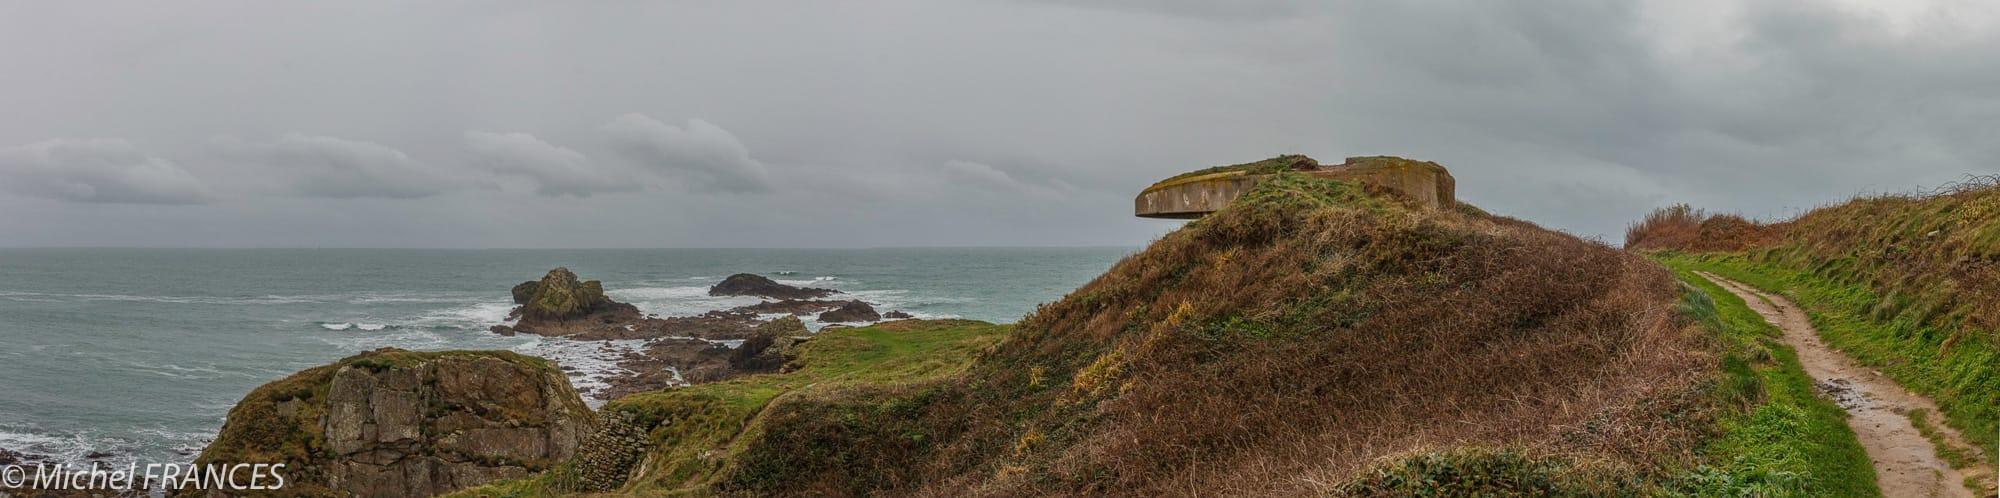 IMB_2190-Panorama